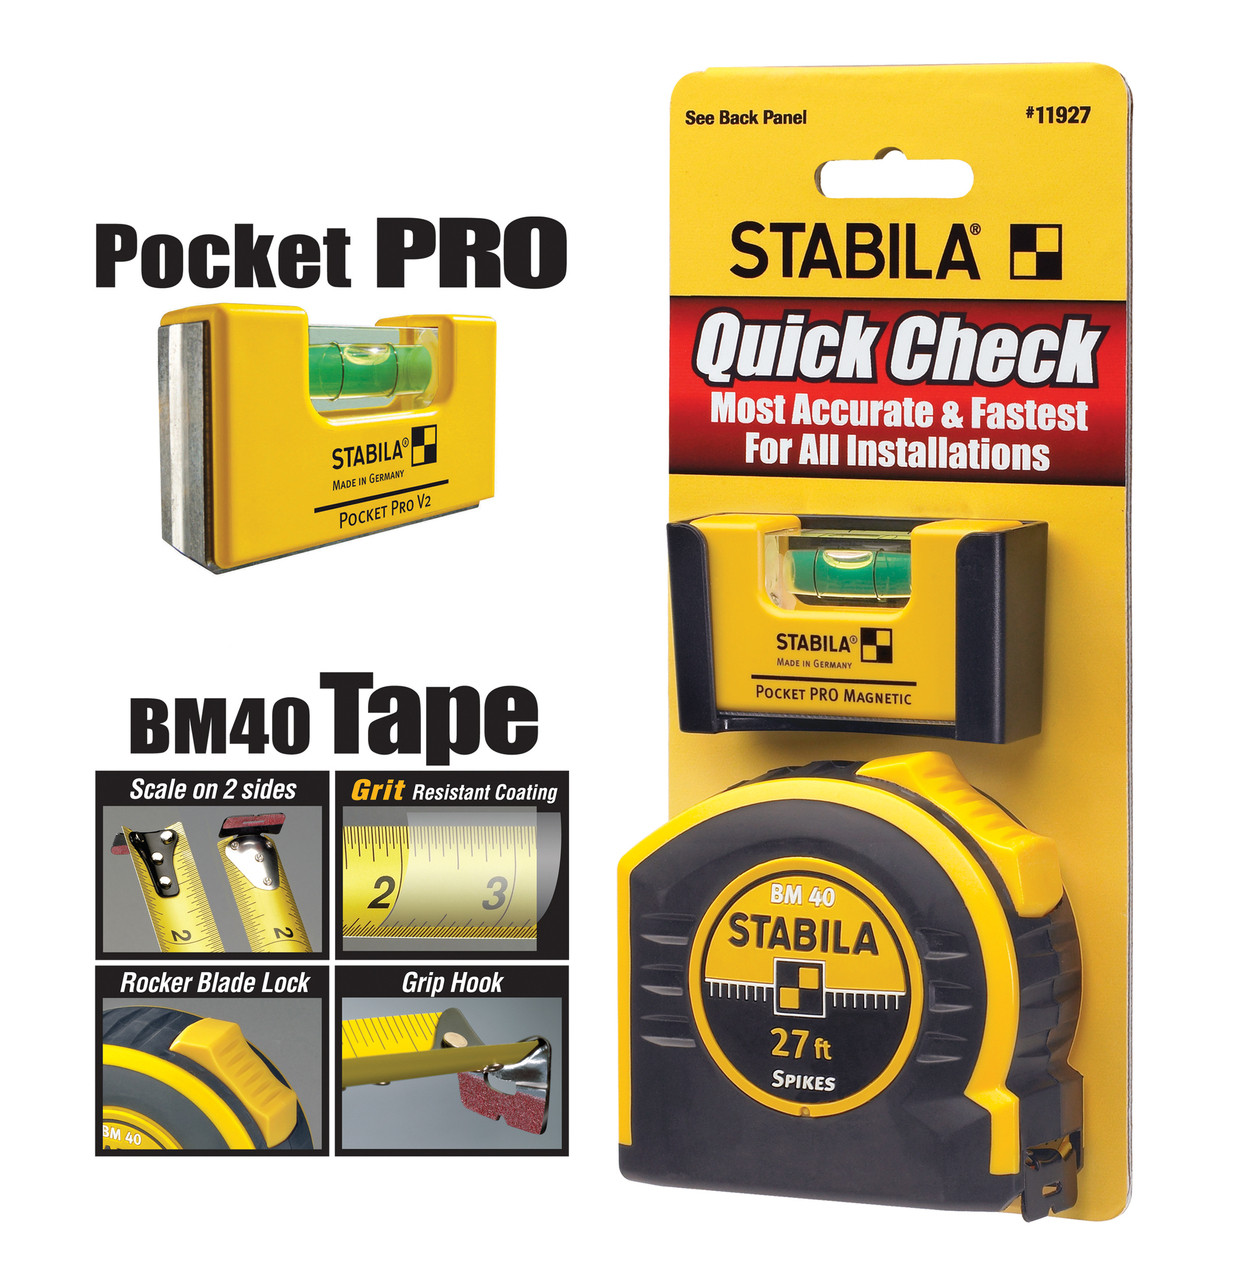 Pocket PRO Plus Level Stabila Quick Check Measuring Tape 27